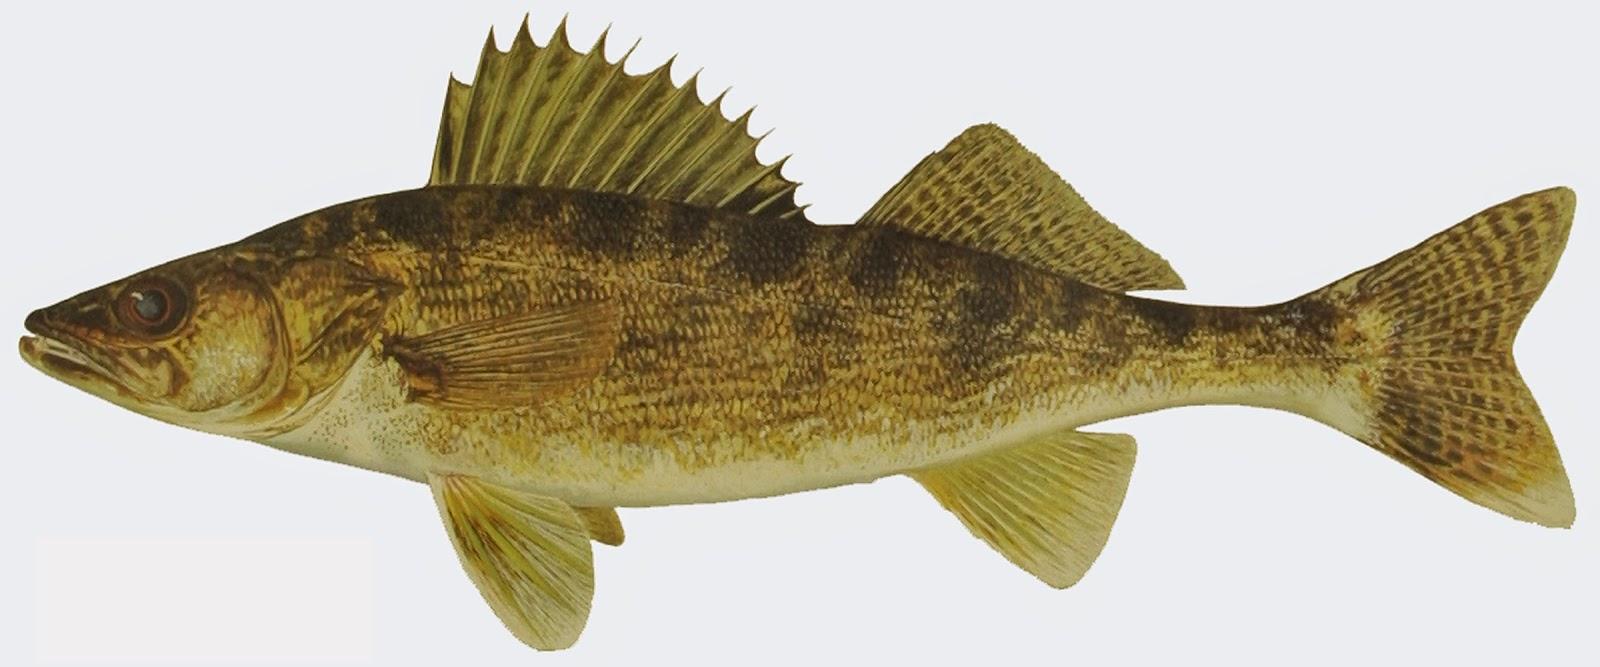 Take it outside fish iowa iowa fish species perch family for Walleye fishing in iowa